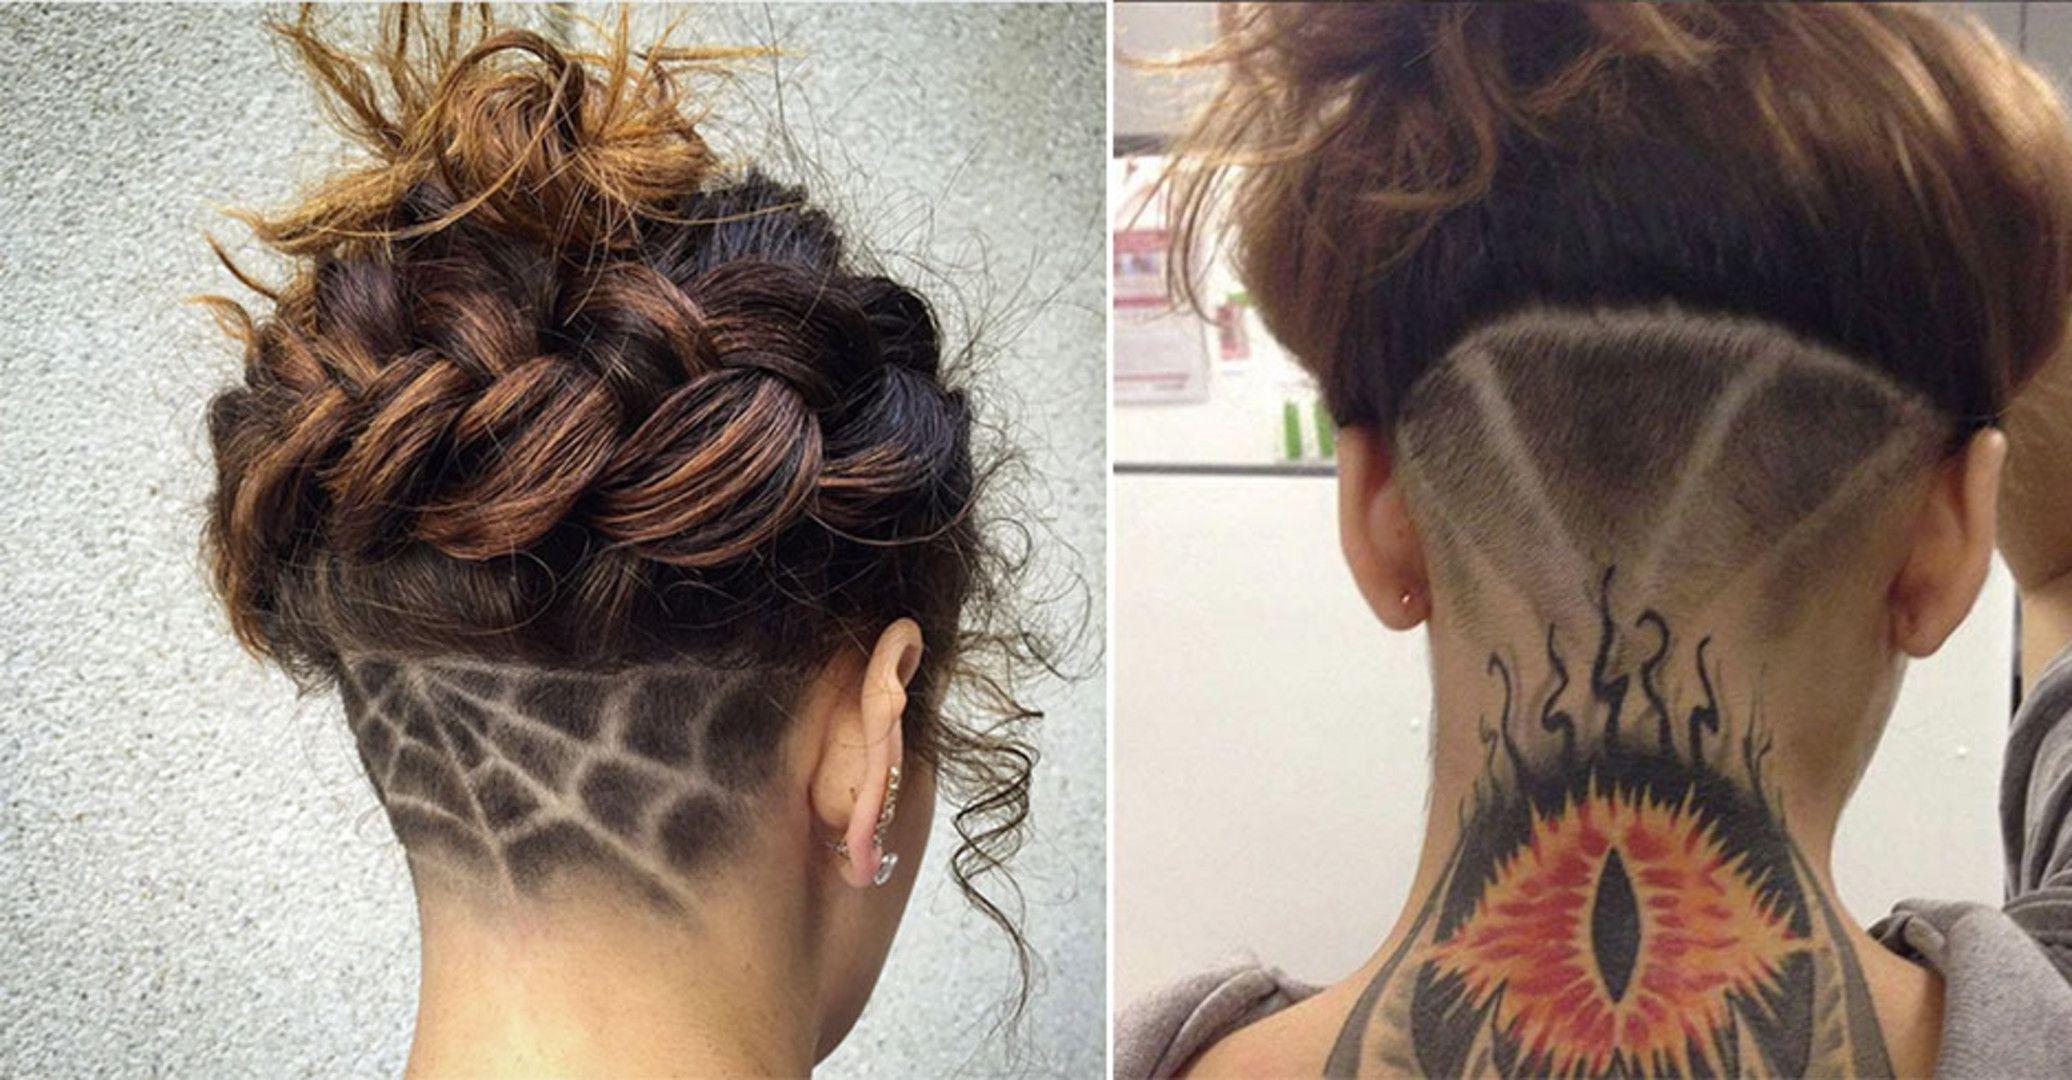 Frisuren Gruselige Undercut Trends für Halloween News Beauty